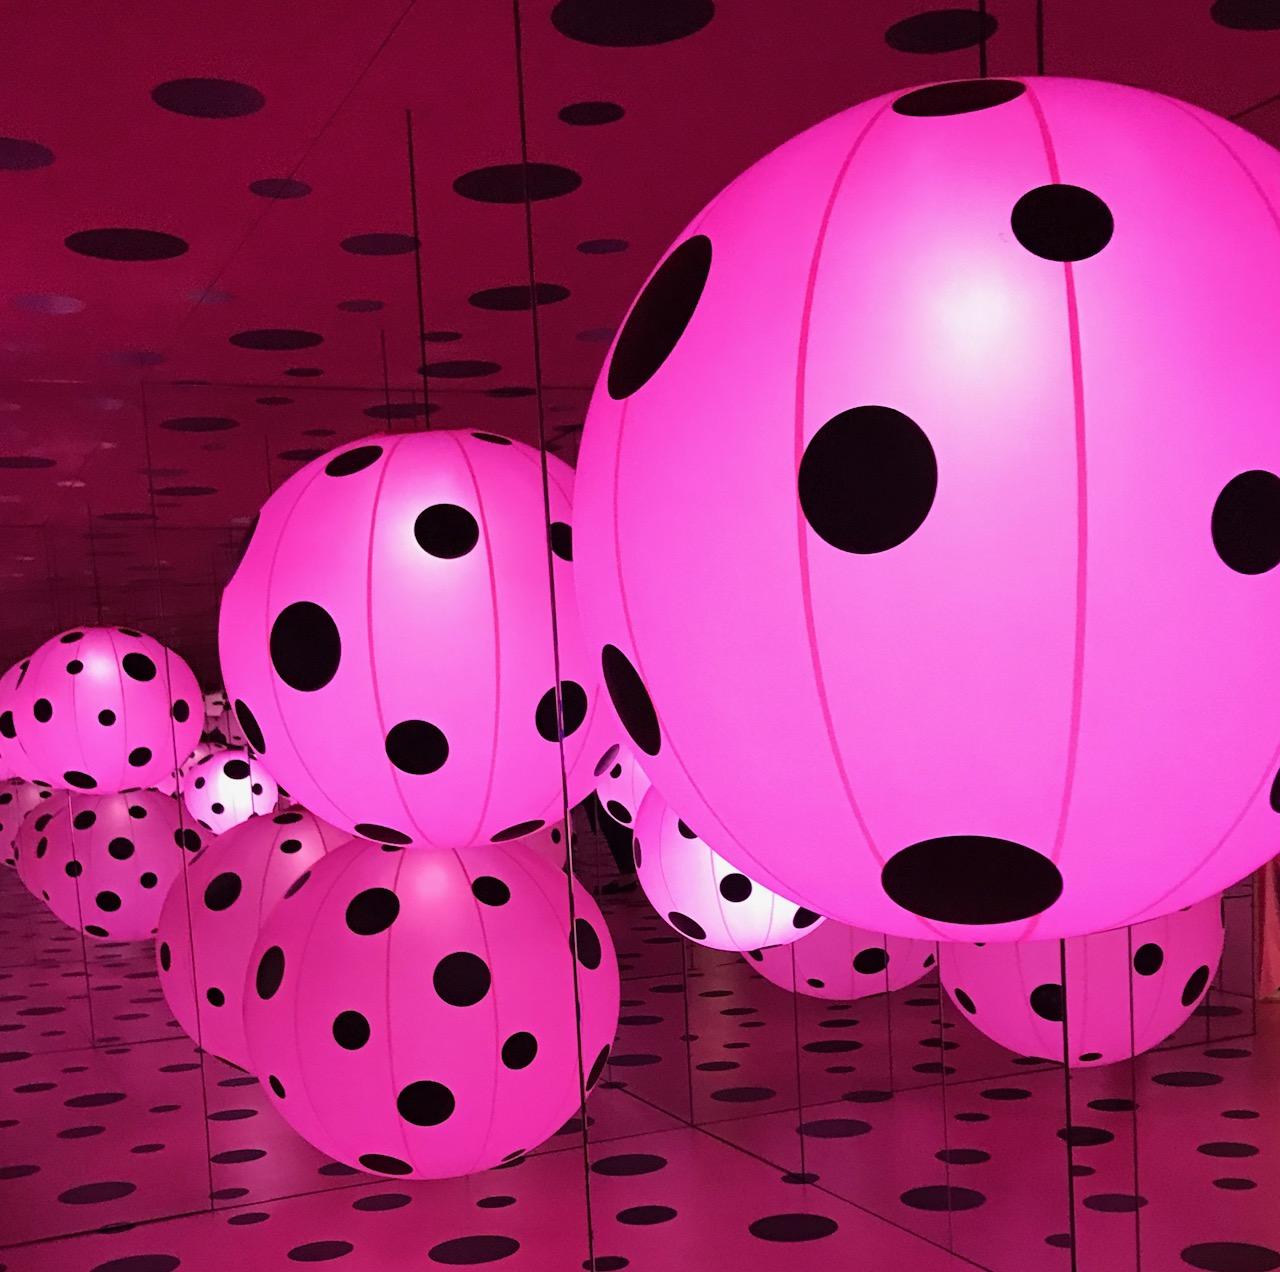 <div class='meta'><div class='origin-logo' data-origin='none'></div><span class='caption-text' data-credit=''>Inside the Broad's Yayoi Kusama: Infinity Mirrors</span></div>